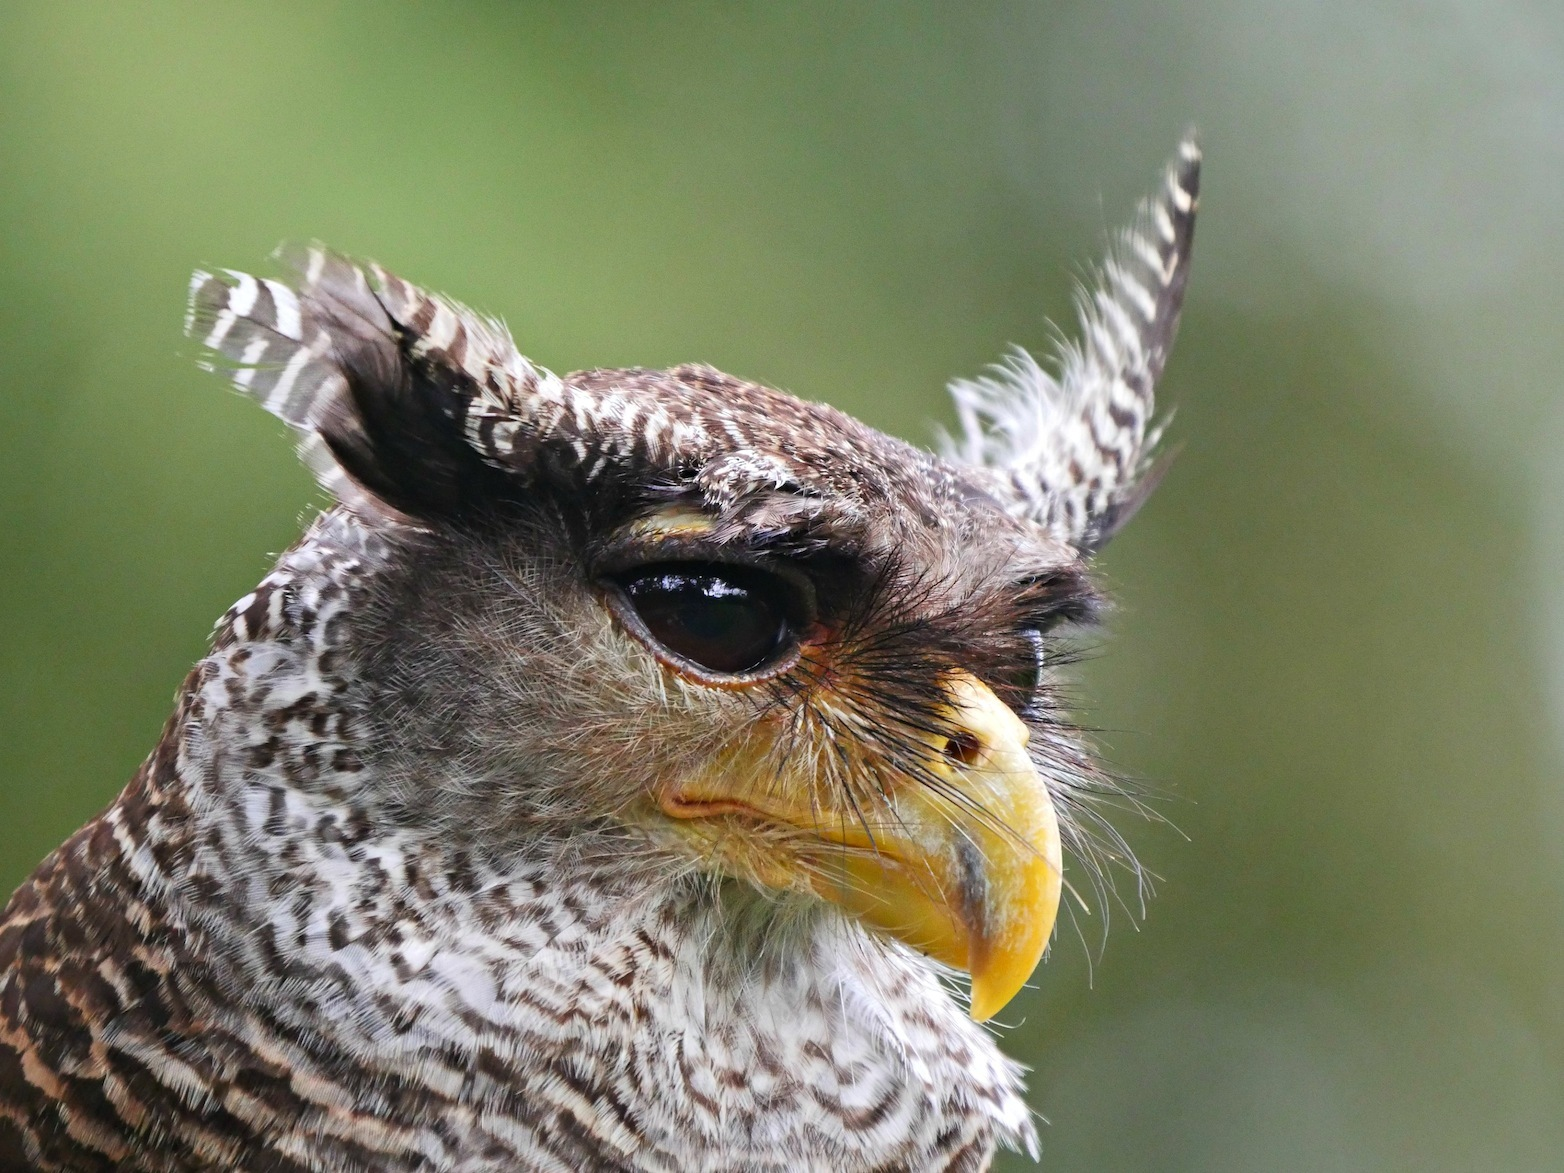 Birds i Bali 4 by kevinmfairley